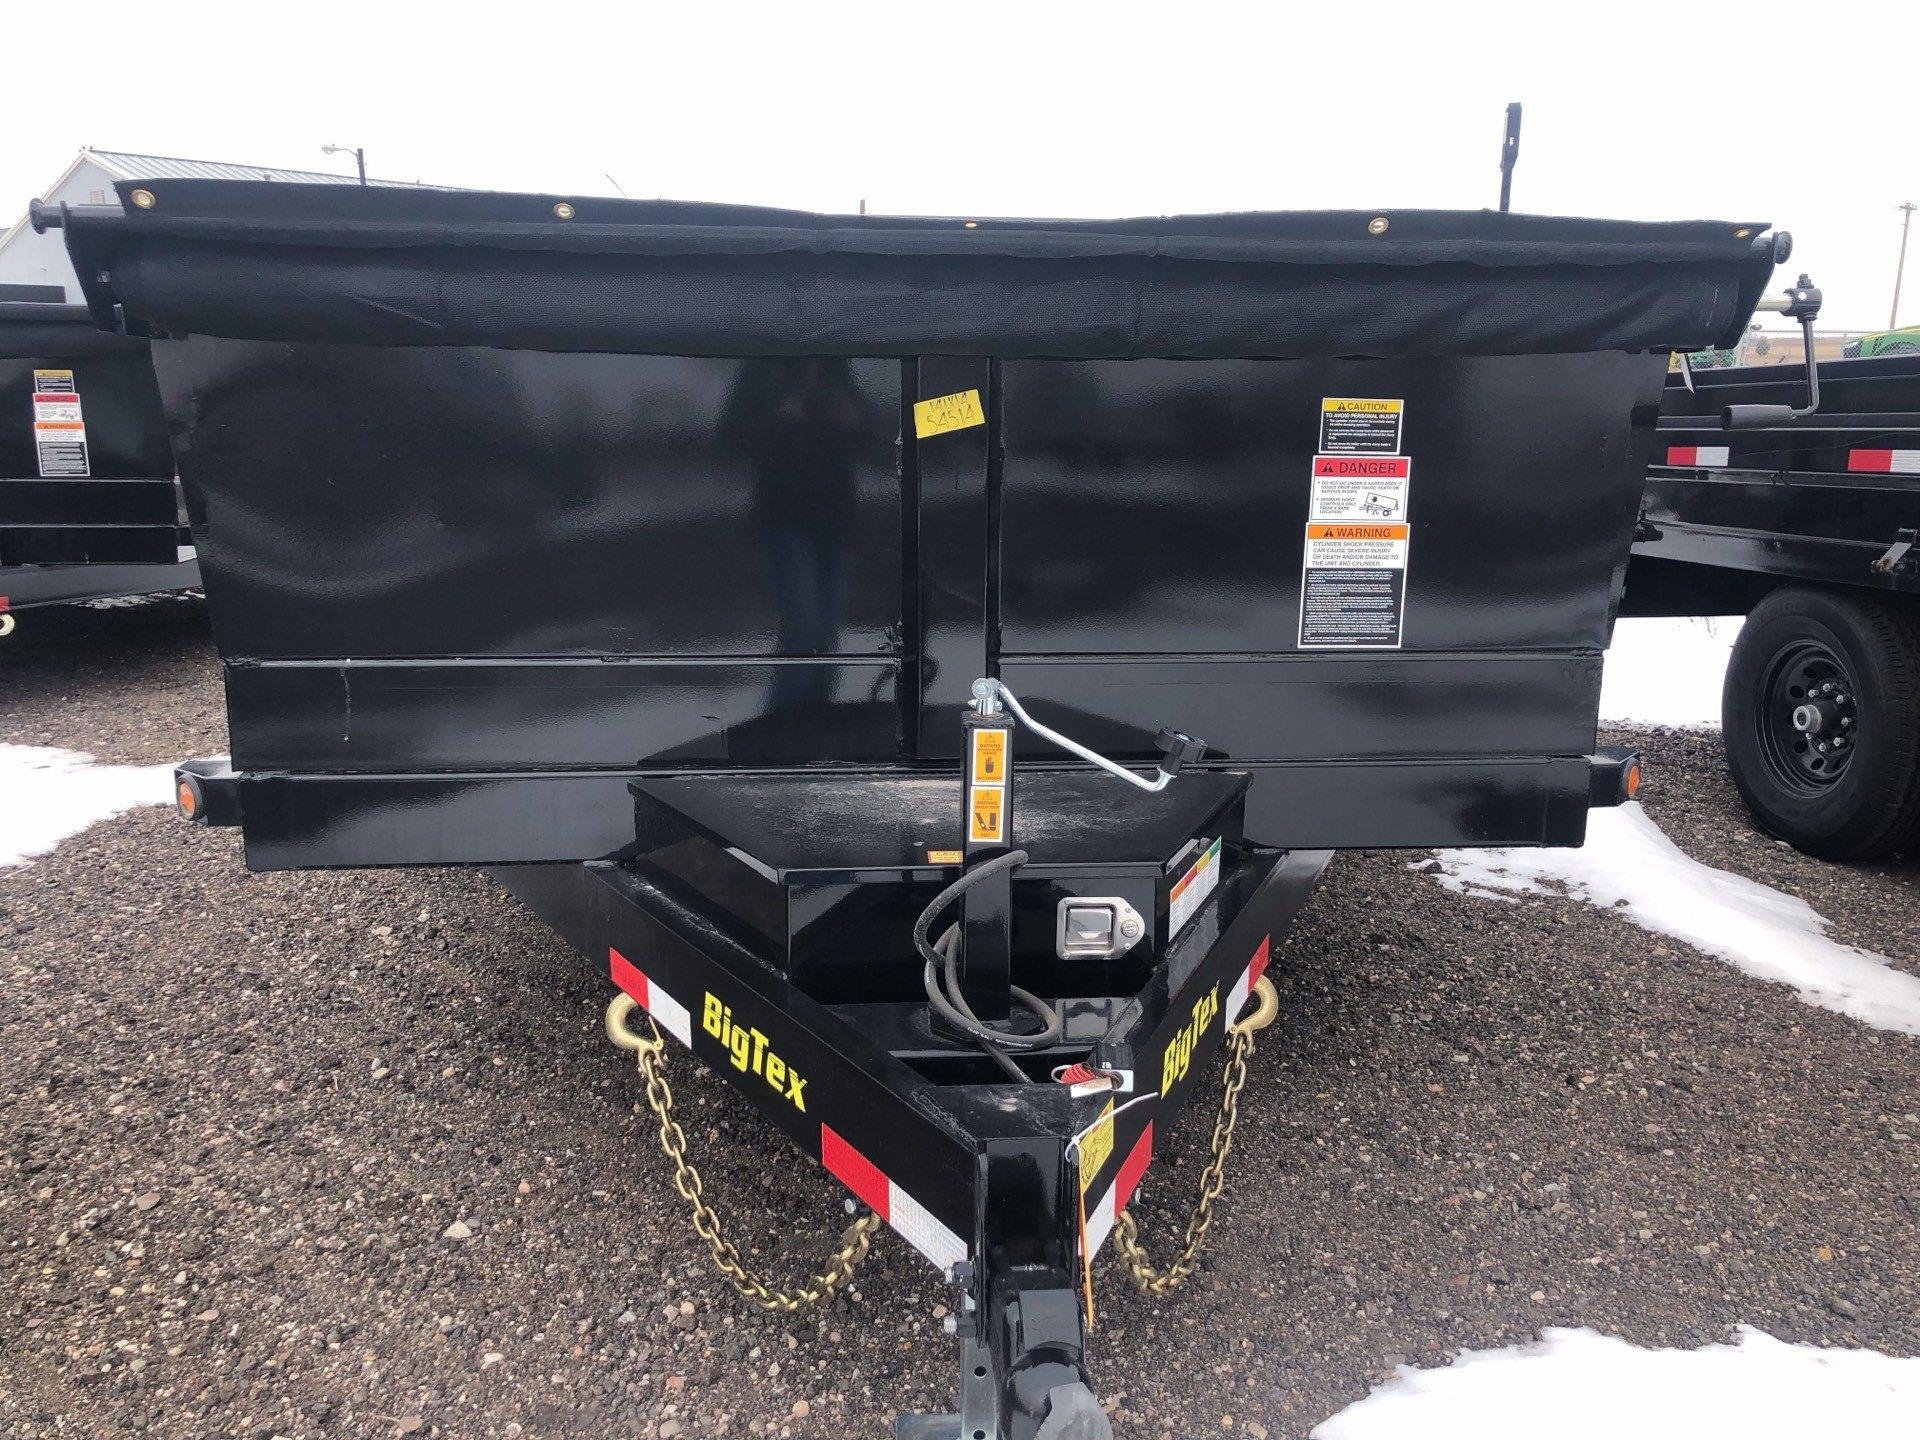 2019 Big Tex Trailers - Manufacturers BIG TEX 14' TANDEM DUMP TRAILER in  Scottsbluff, Nebraska